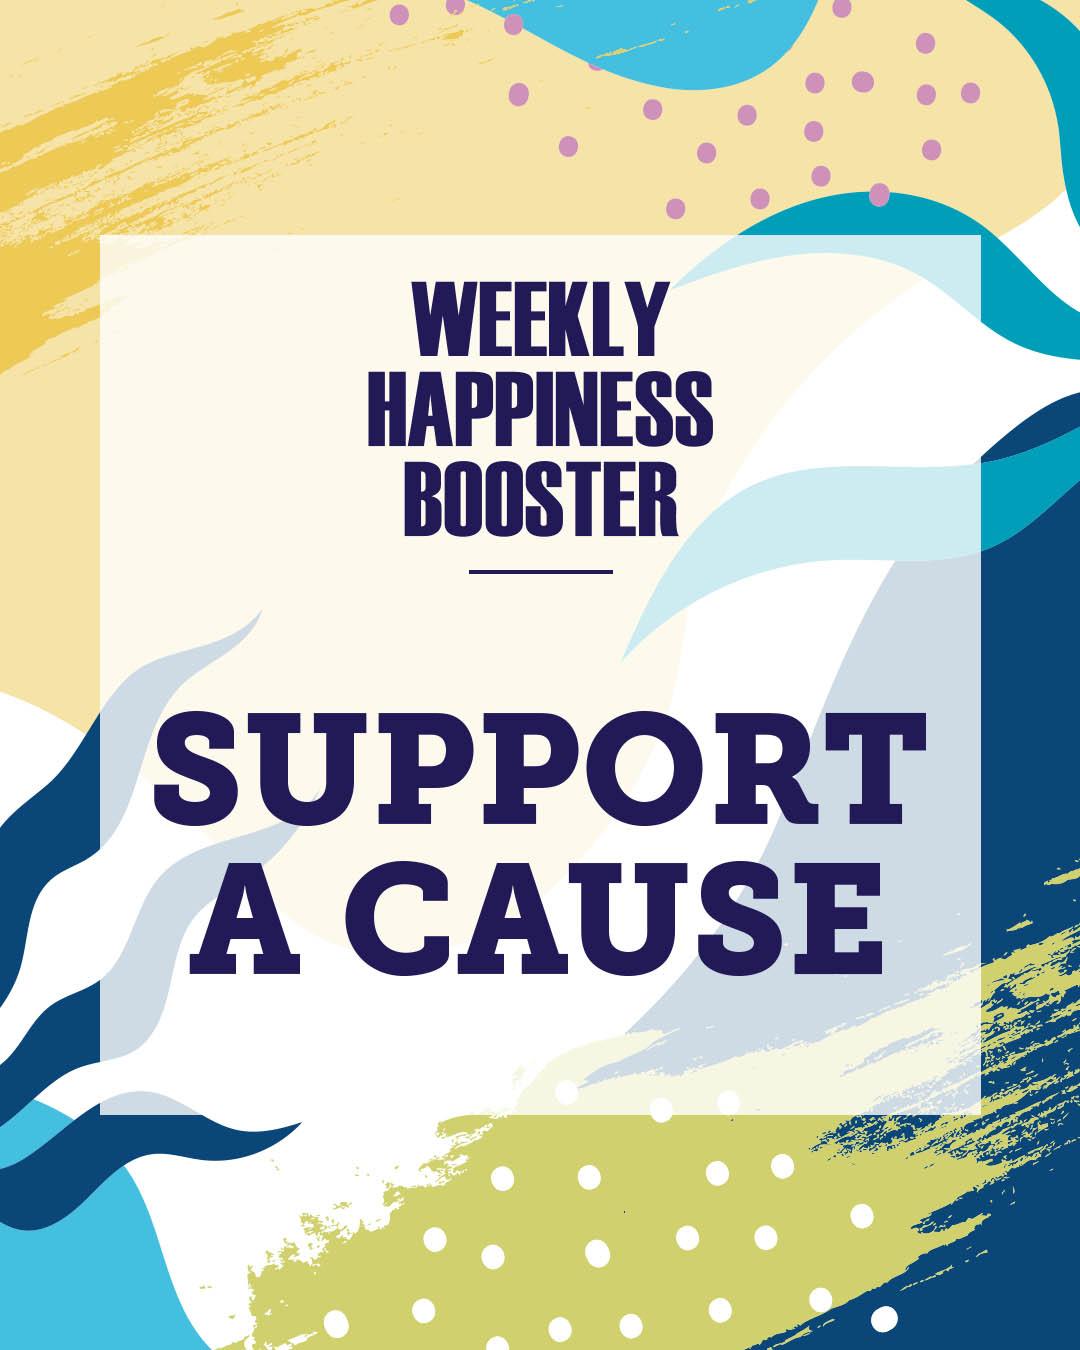 0020-Booster-Eng-Support a Cause-Insta.jpg